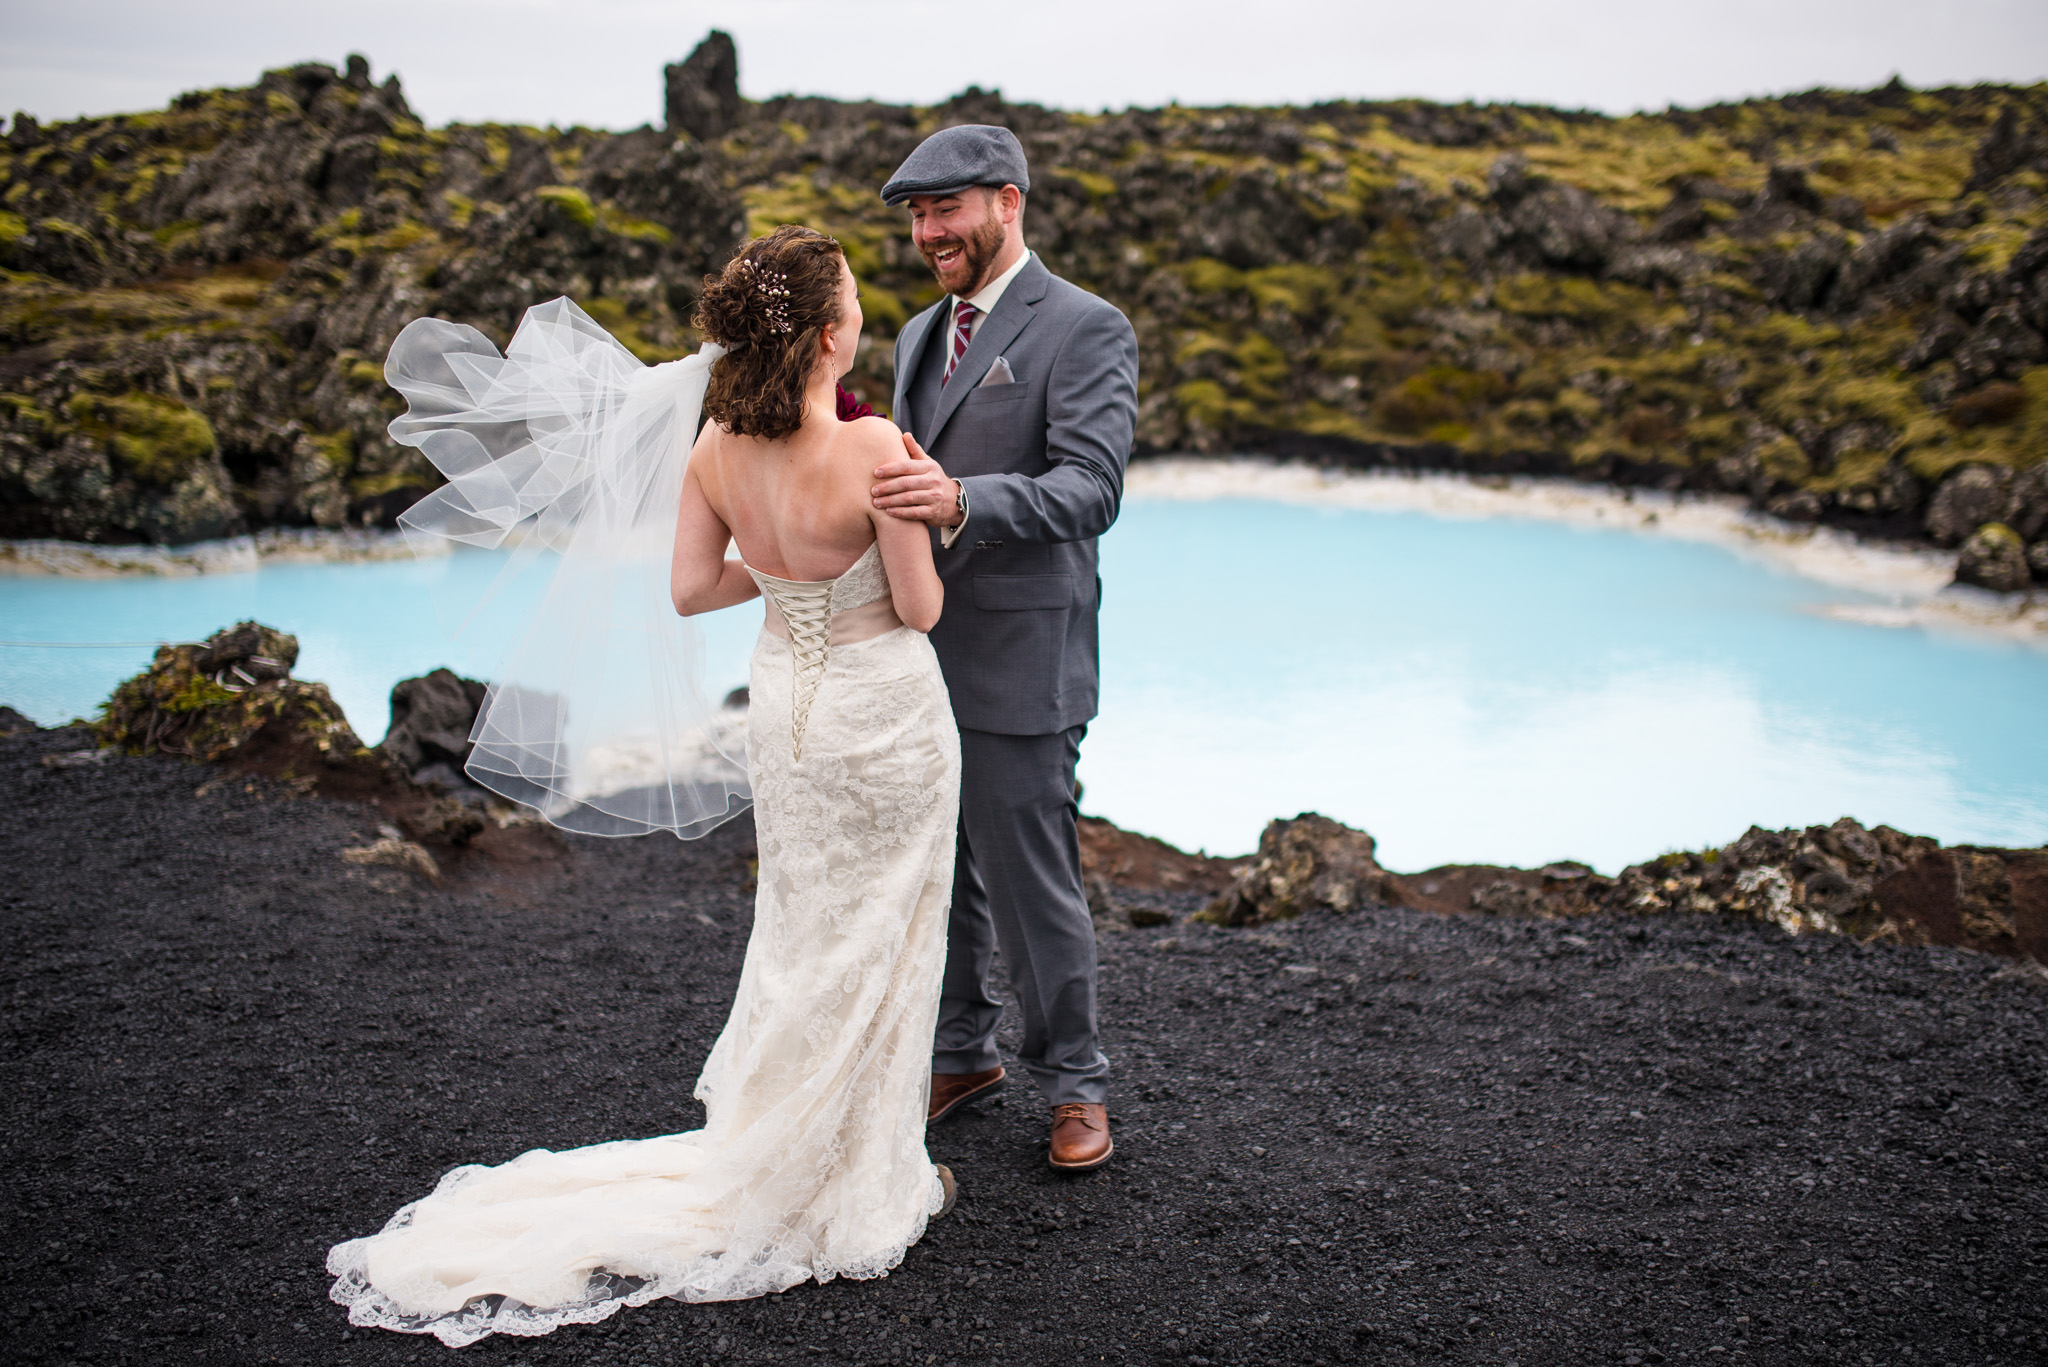 reykjavik-elopement-iceland-reykjanes-victoria-wedding-photographers-16.jpg